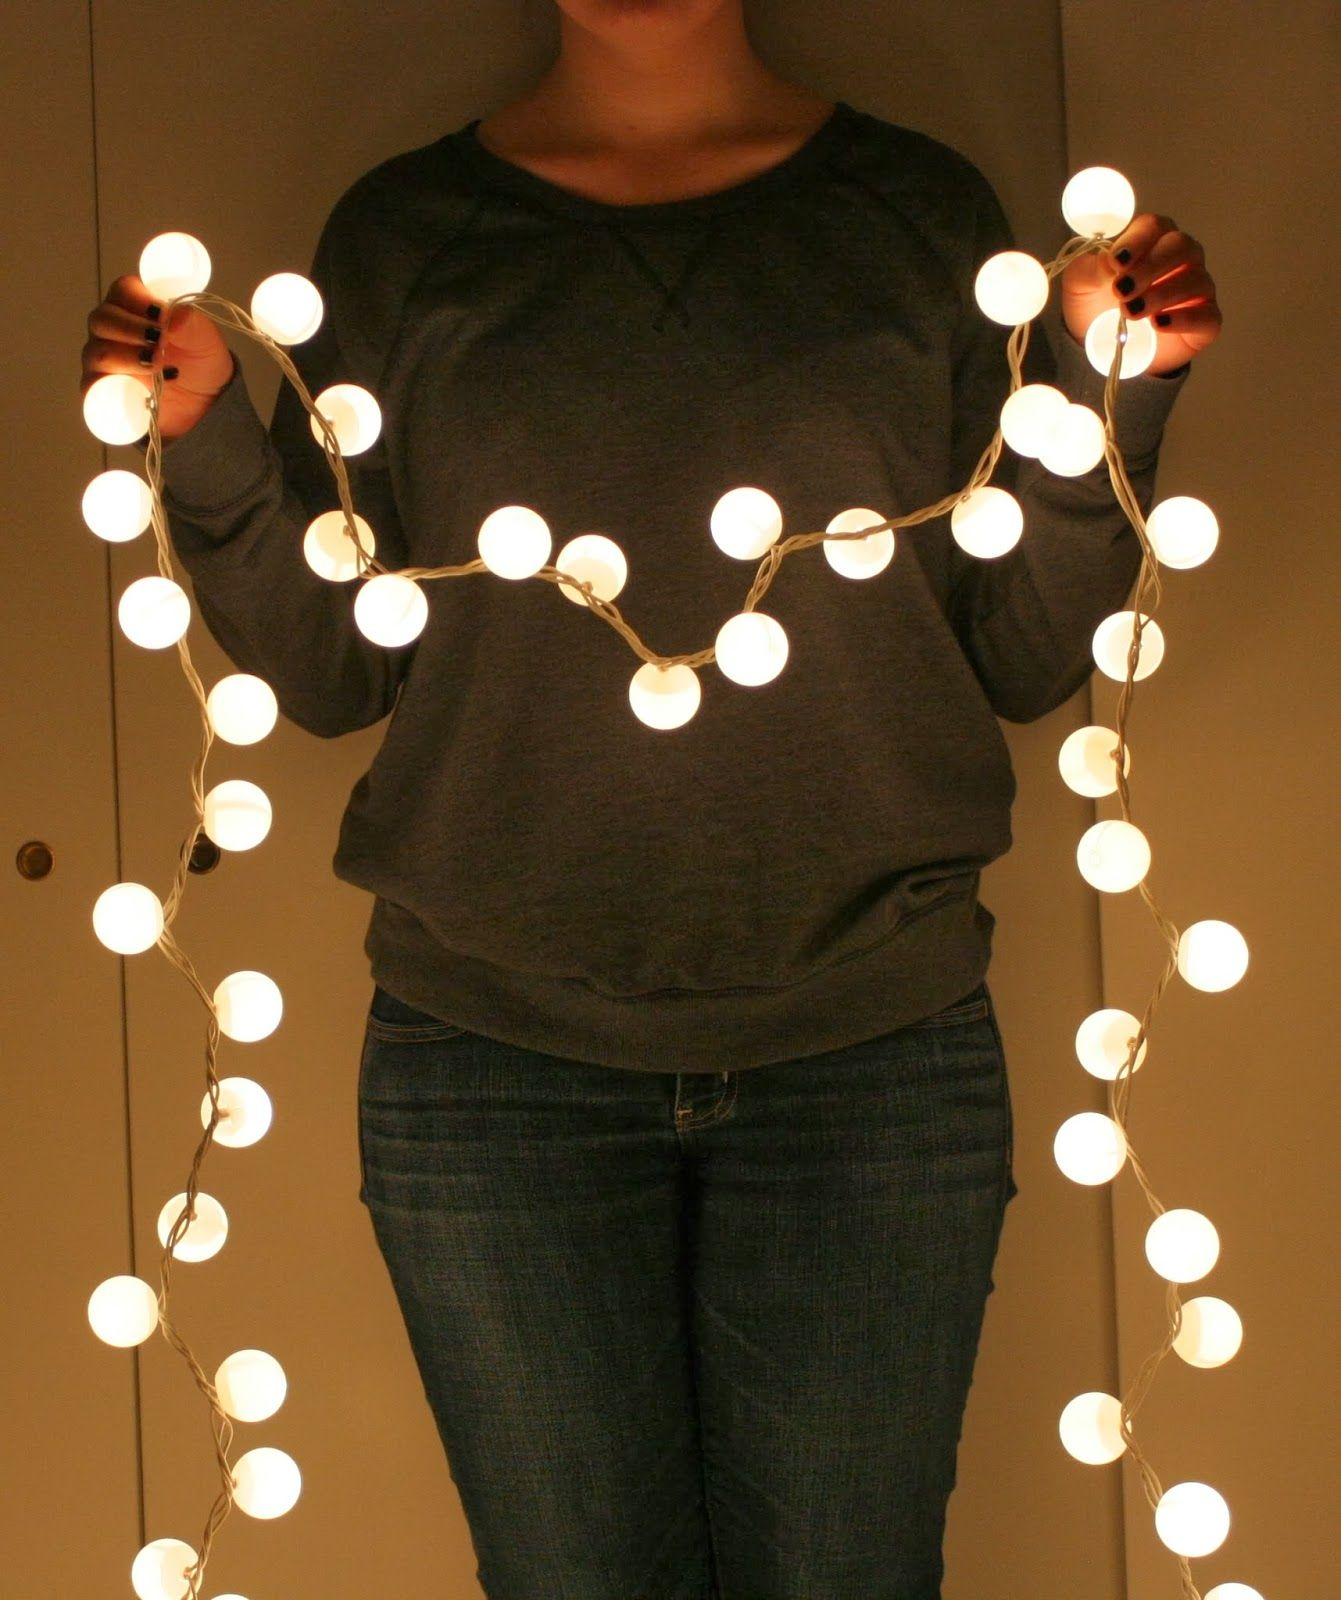 diy party lighting. DIY Ping Pong Ball Party Lights Tutorial More Diy Lighting T